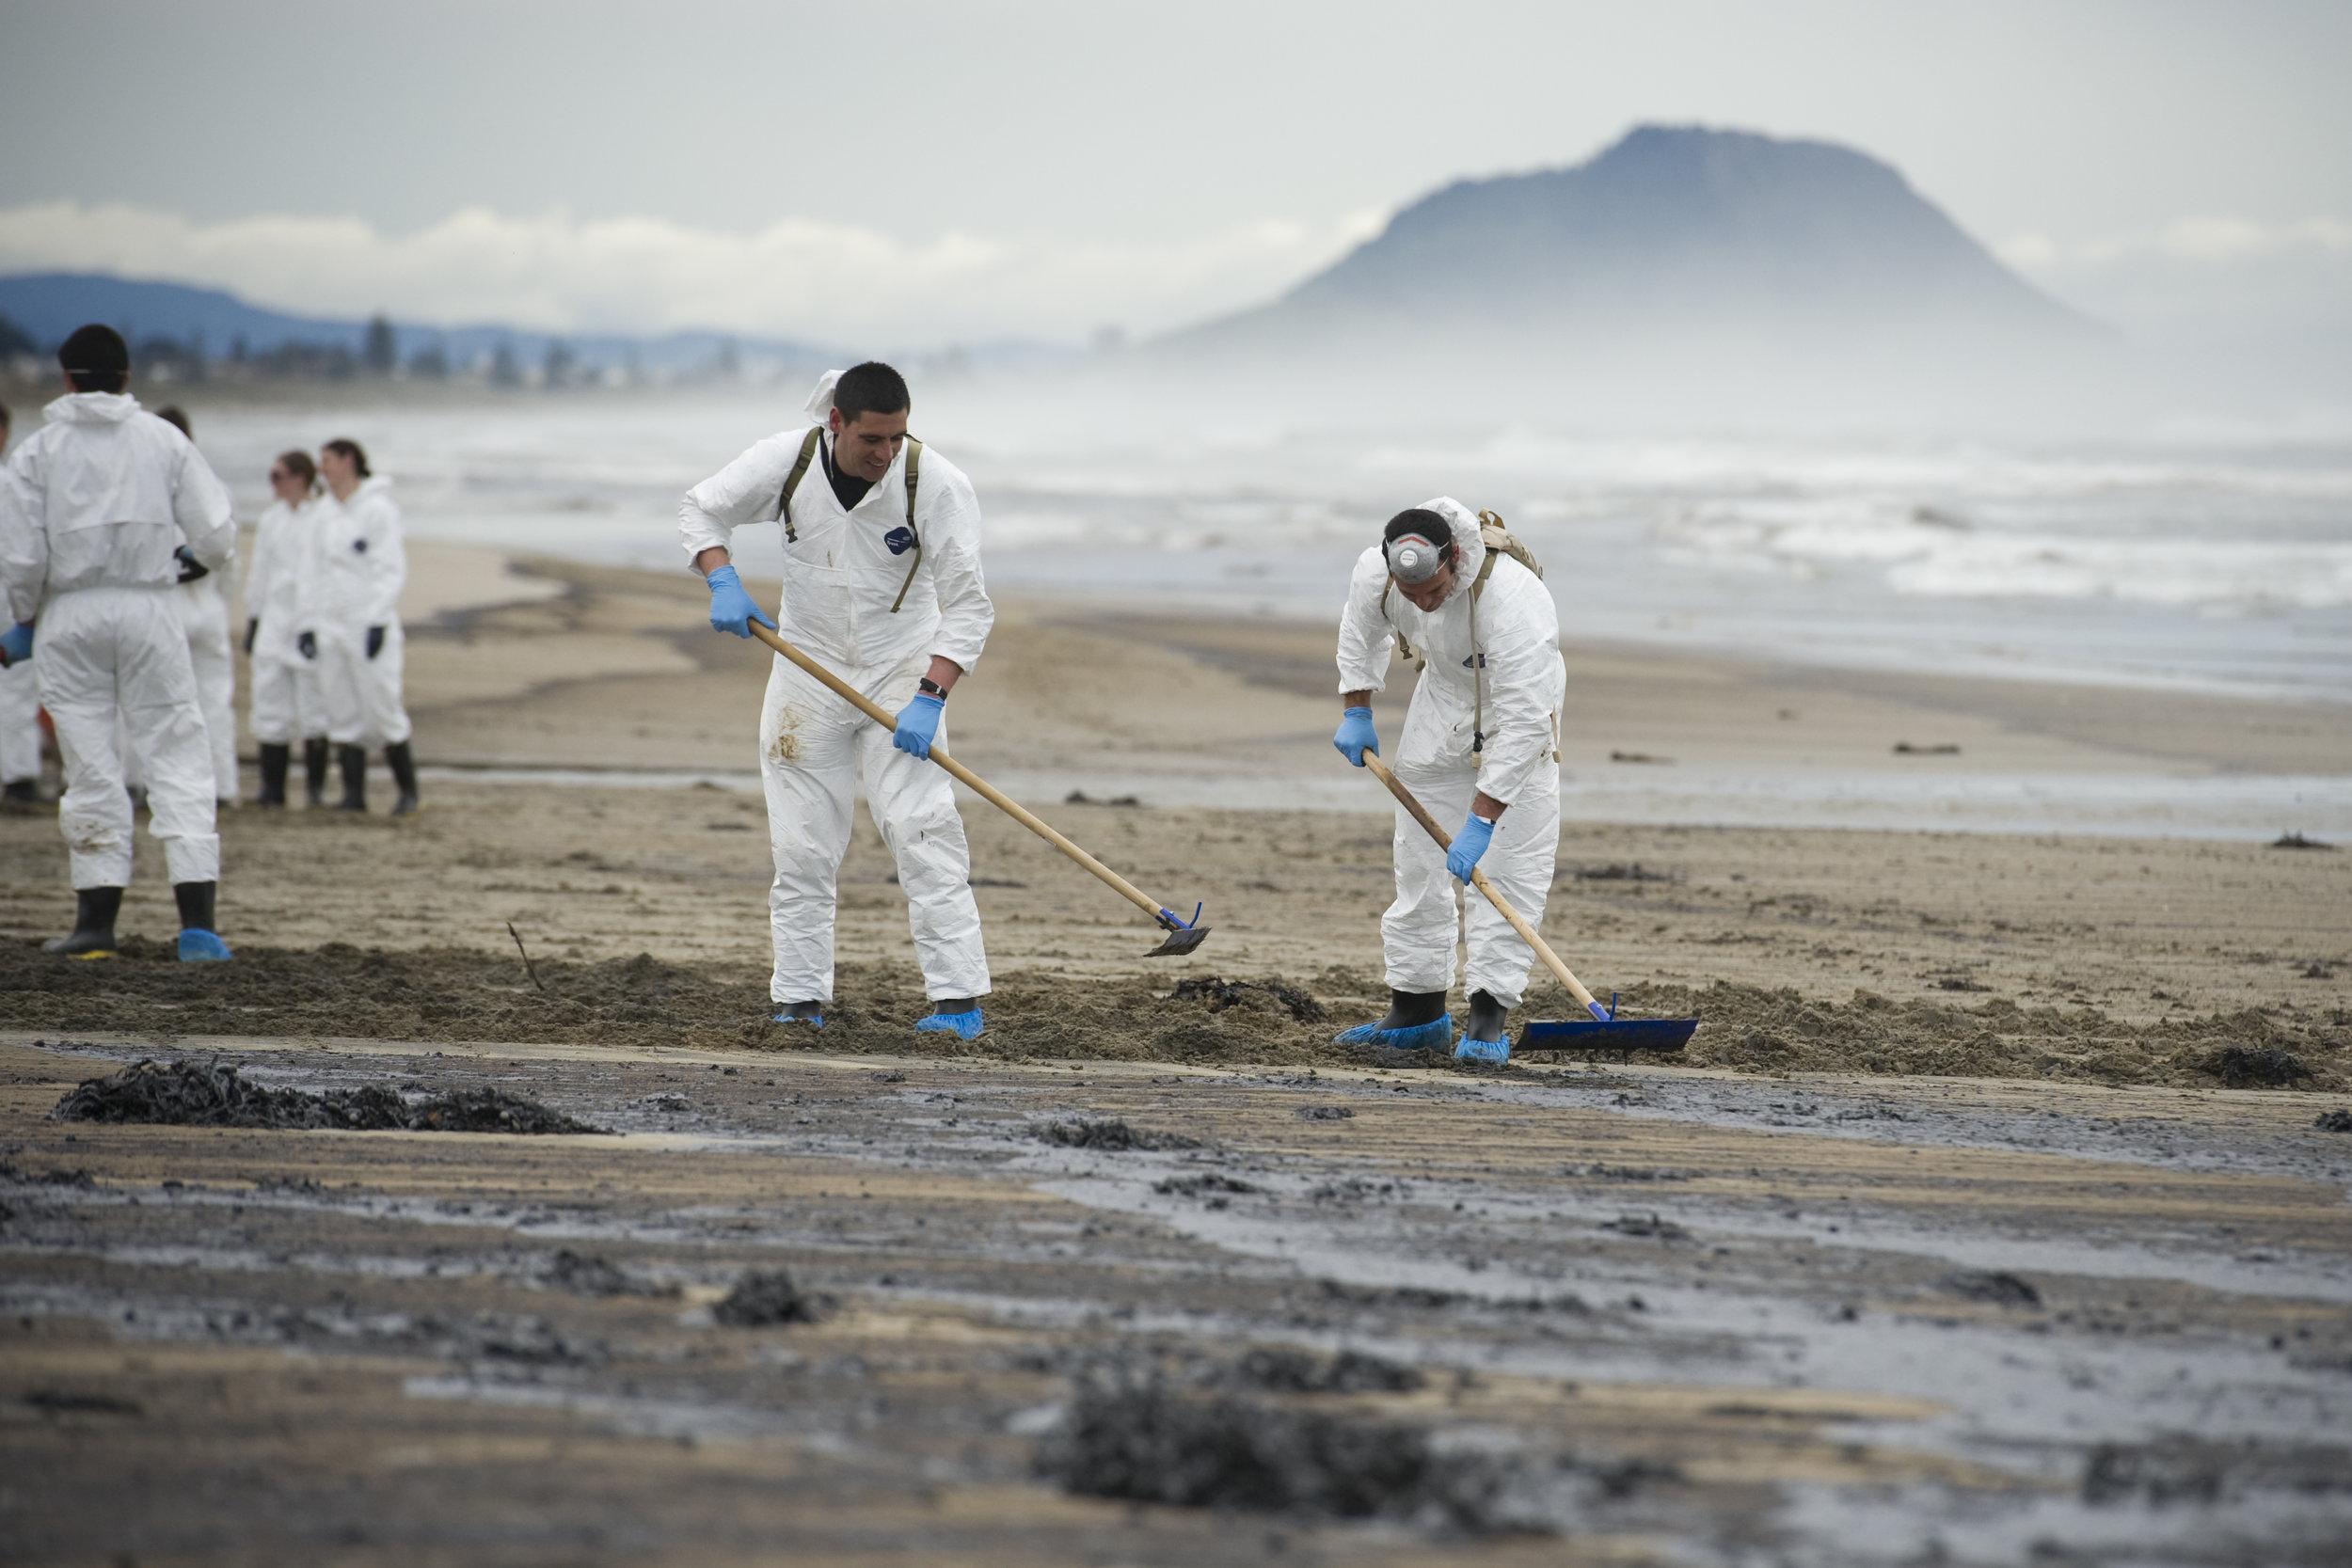 Rena_oil_spill_cleanup.jpg